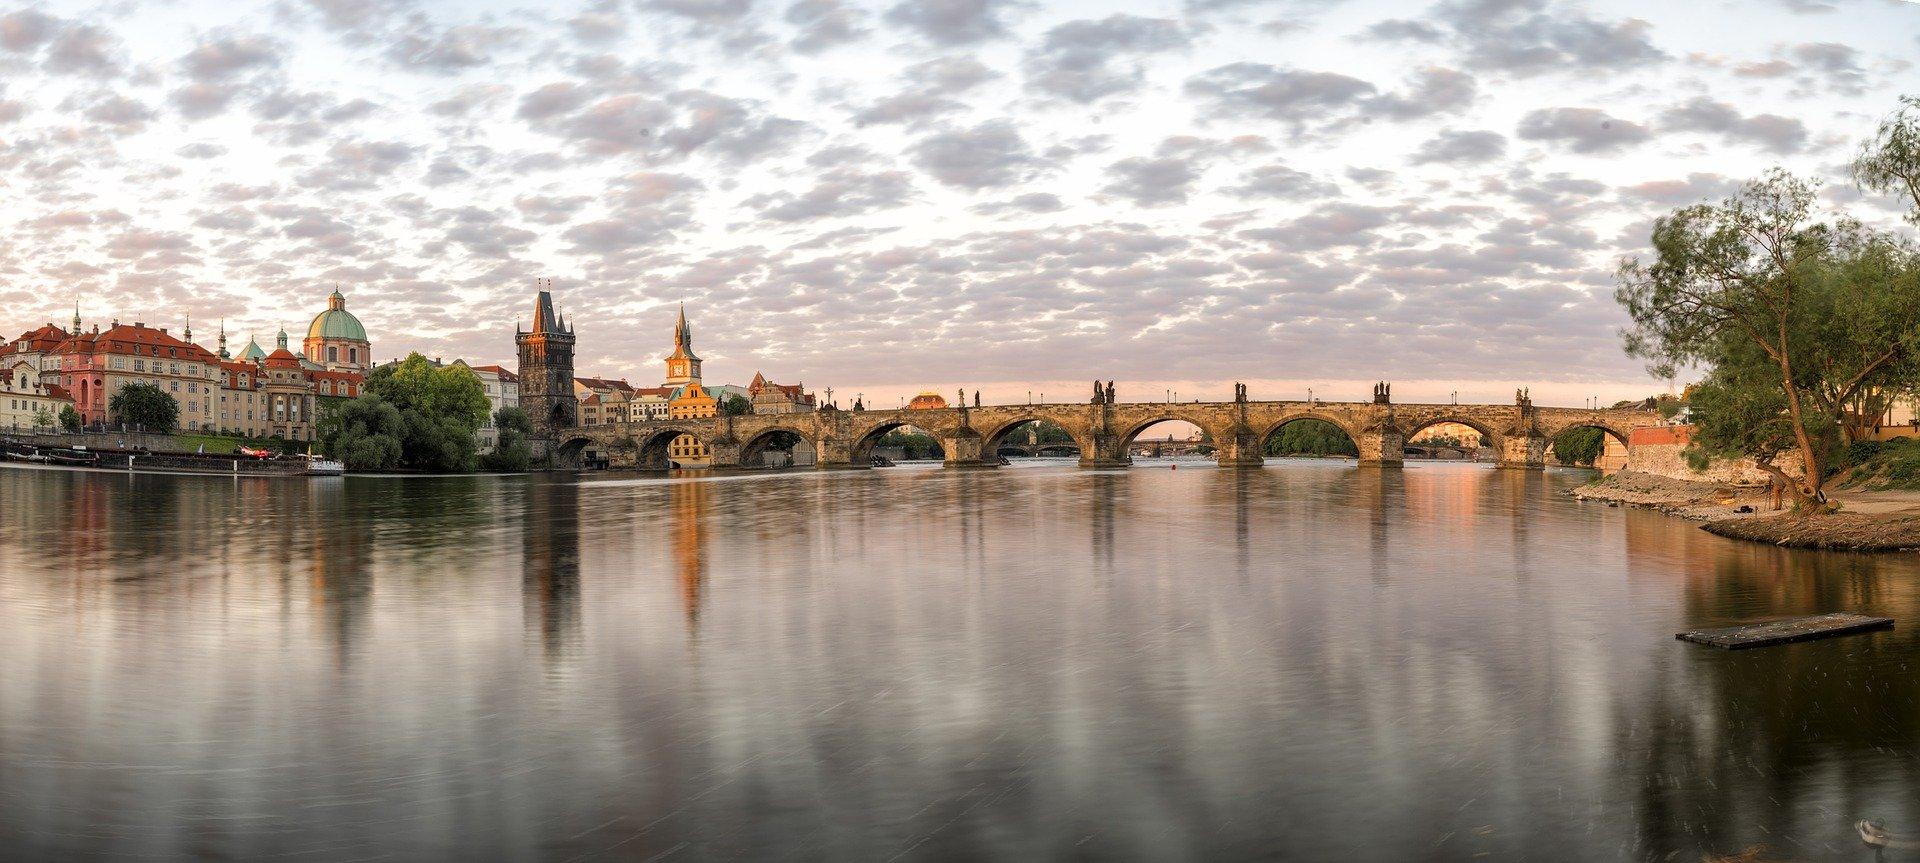 View of Charles Bridge from the Vltava River in Prague